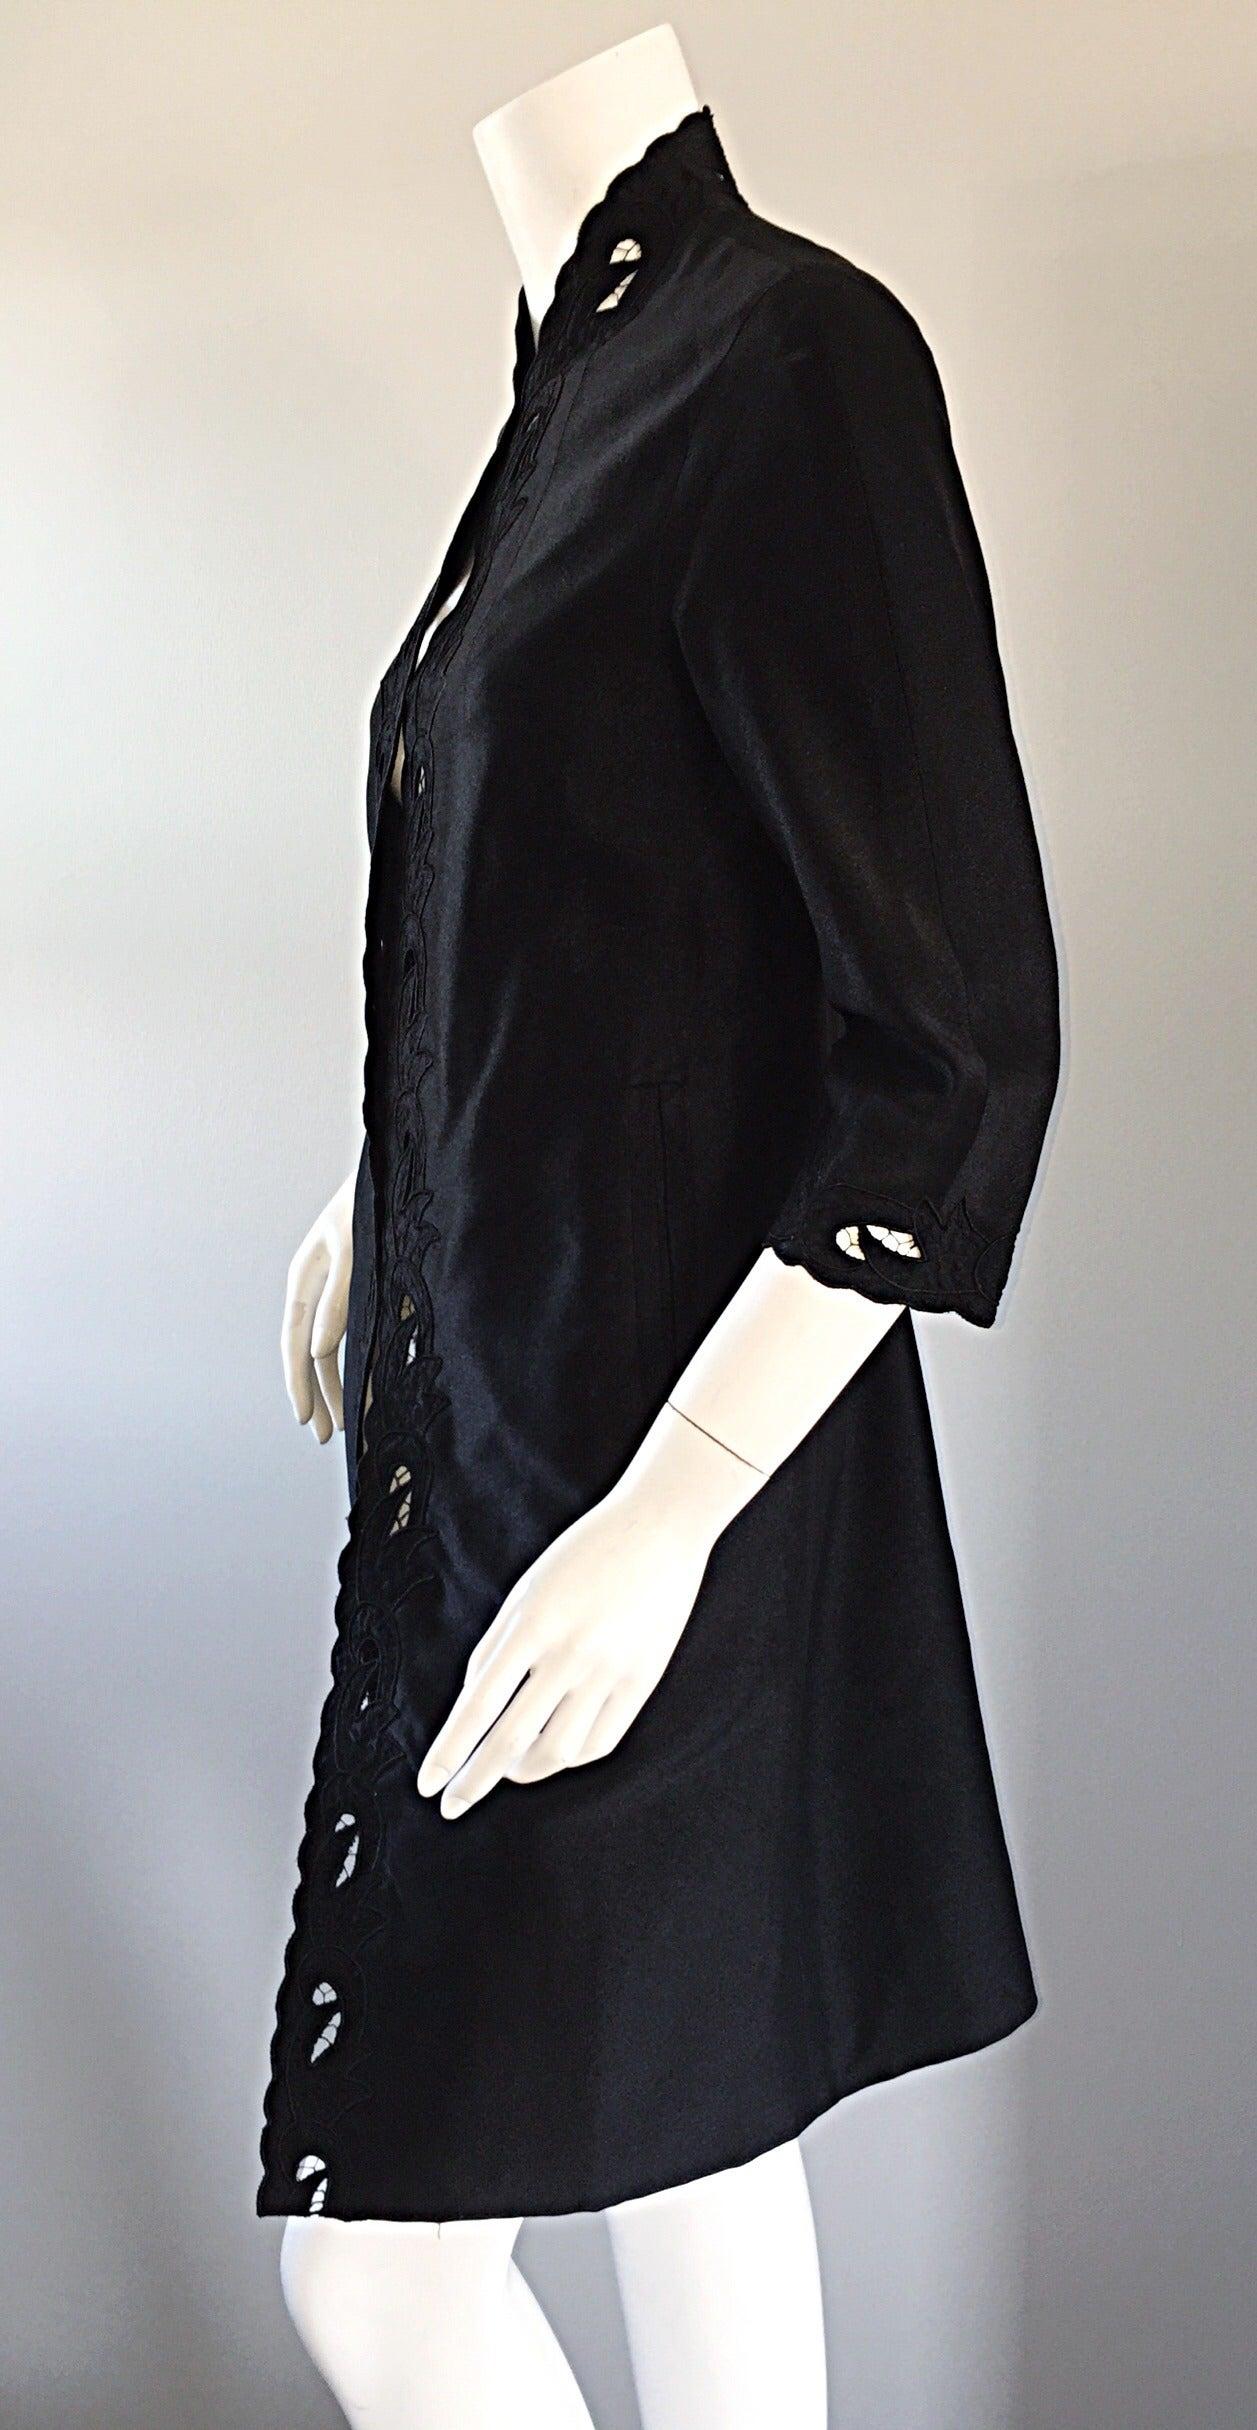 Chic 1940s Black Duster / Opera Jacket w/ Crochet Details + Scalloped Edges 5